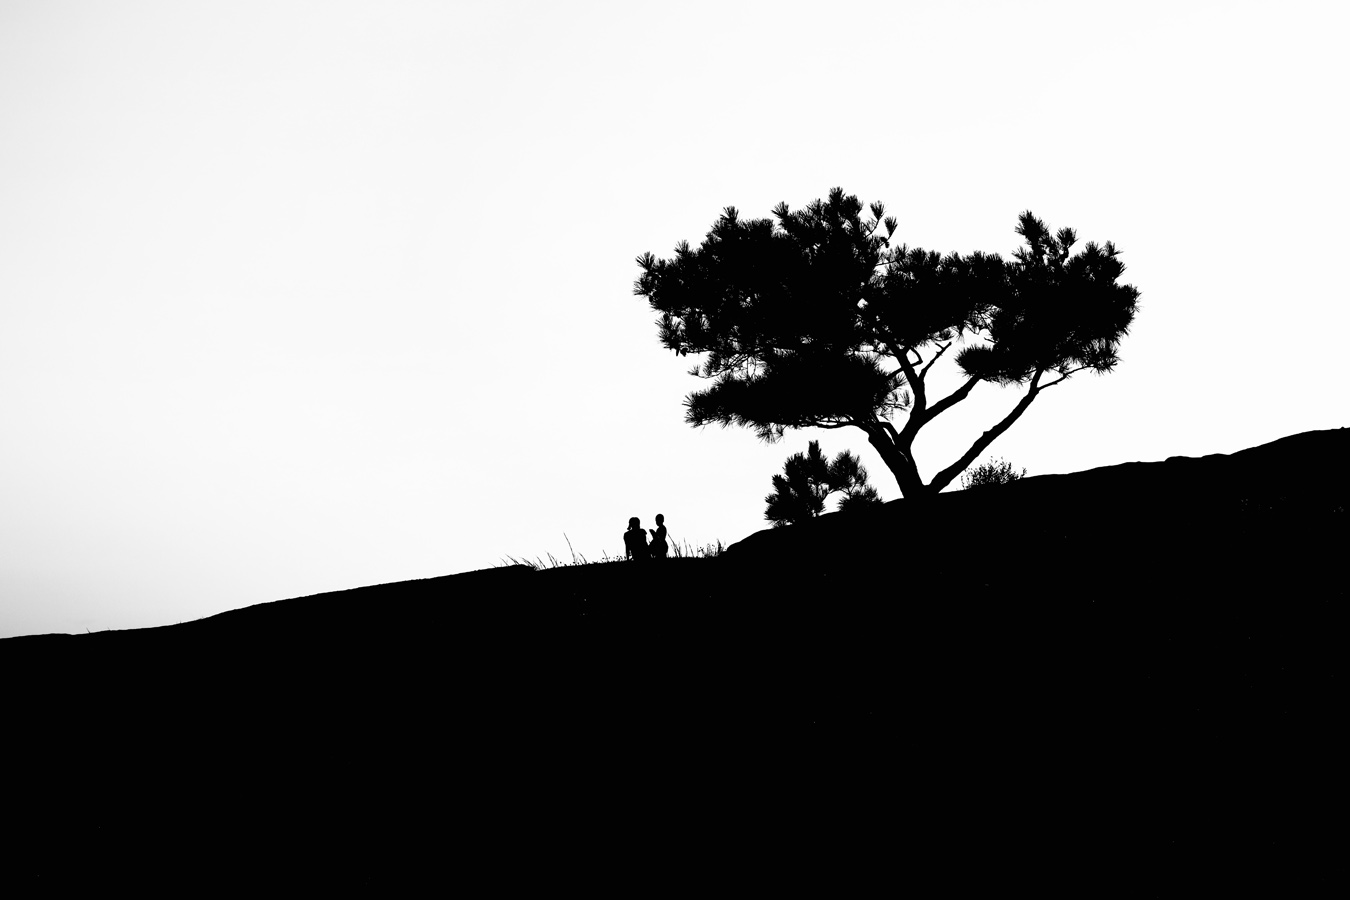 Hill0001.jpg